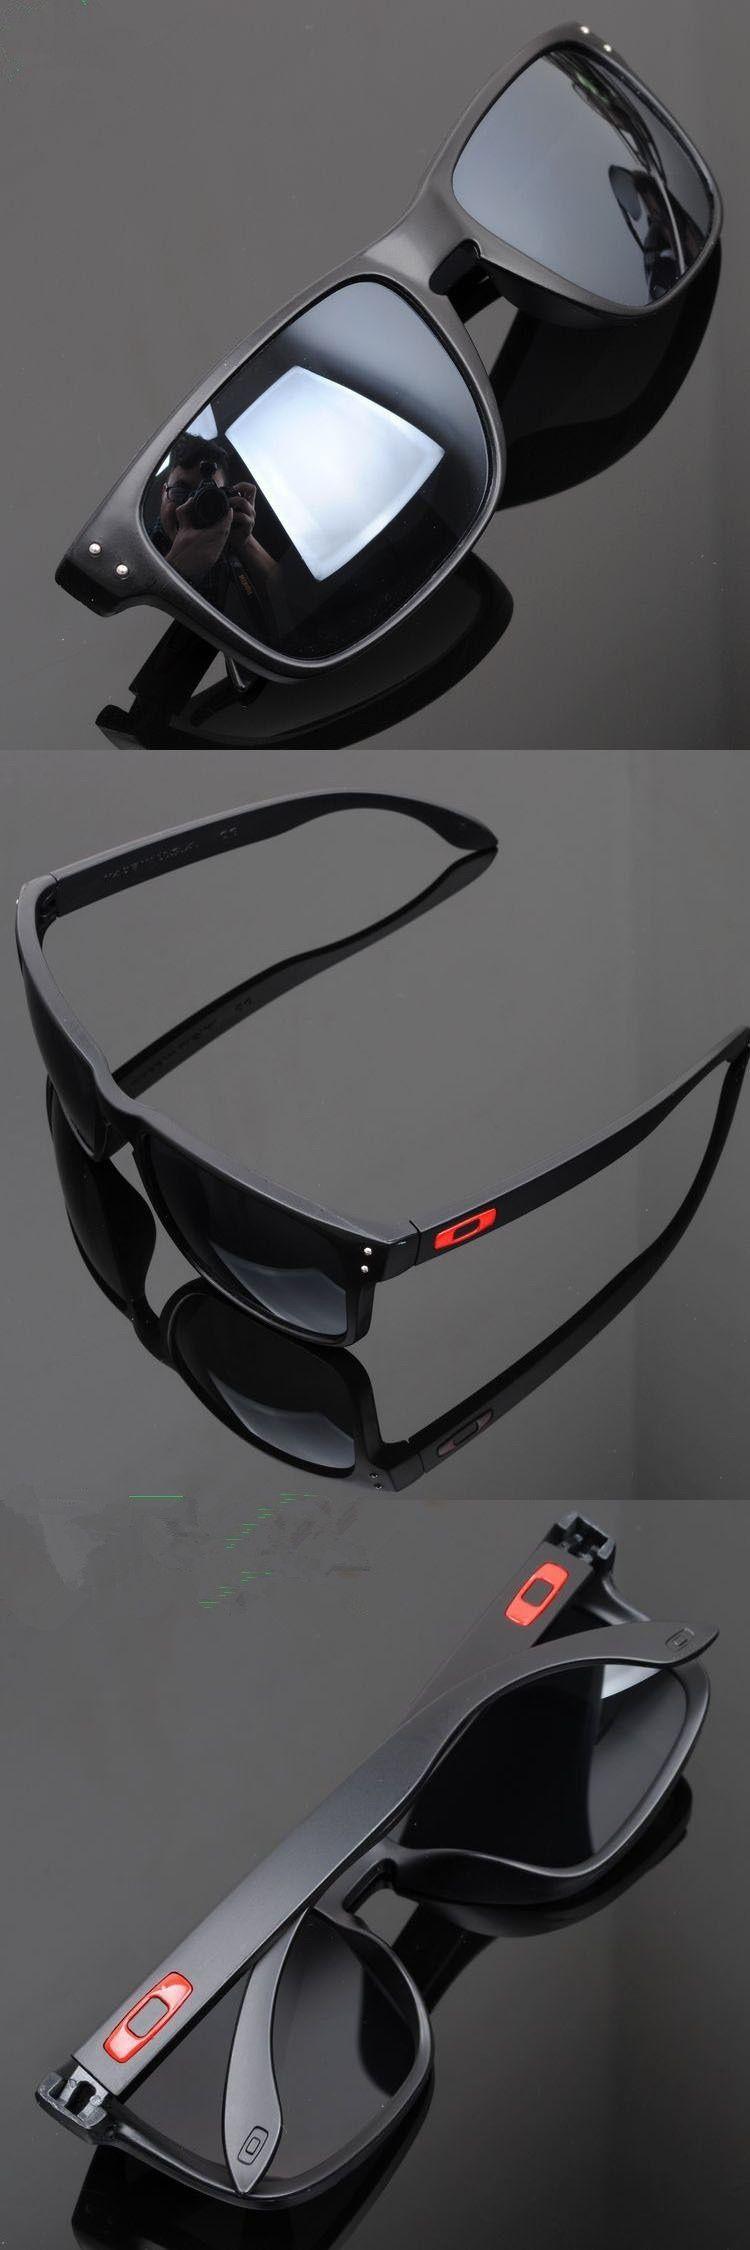 ZXG Multicolor Aviator Sunglasses ( 2018 New neutral fashion Polarized Sunglasses sum )